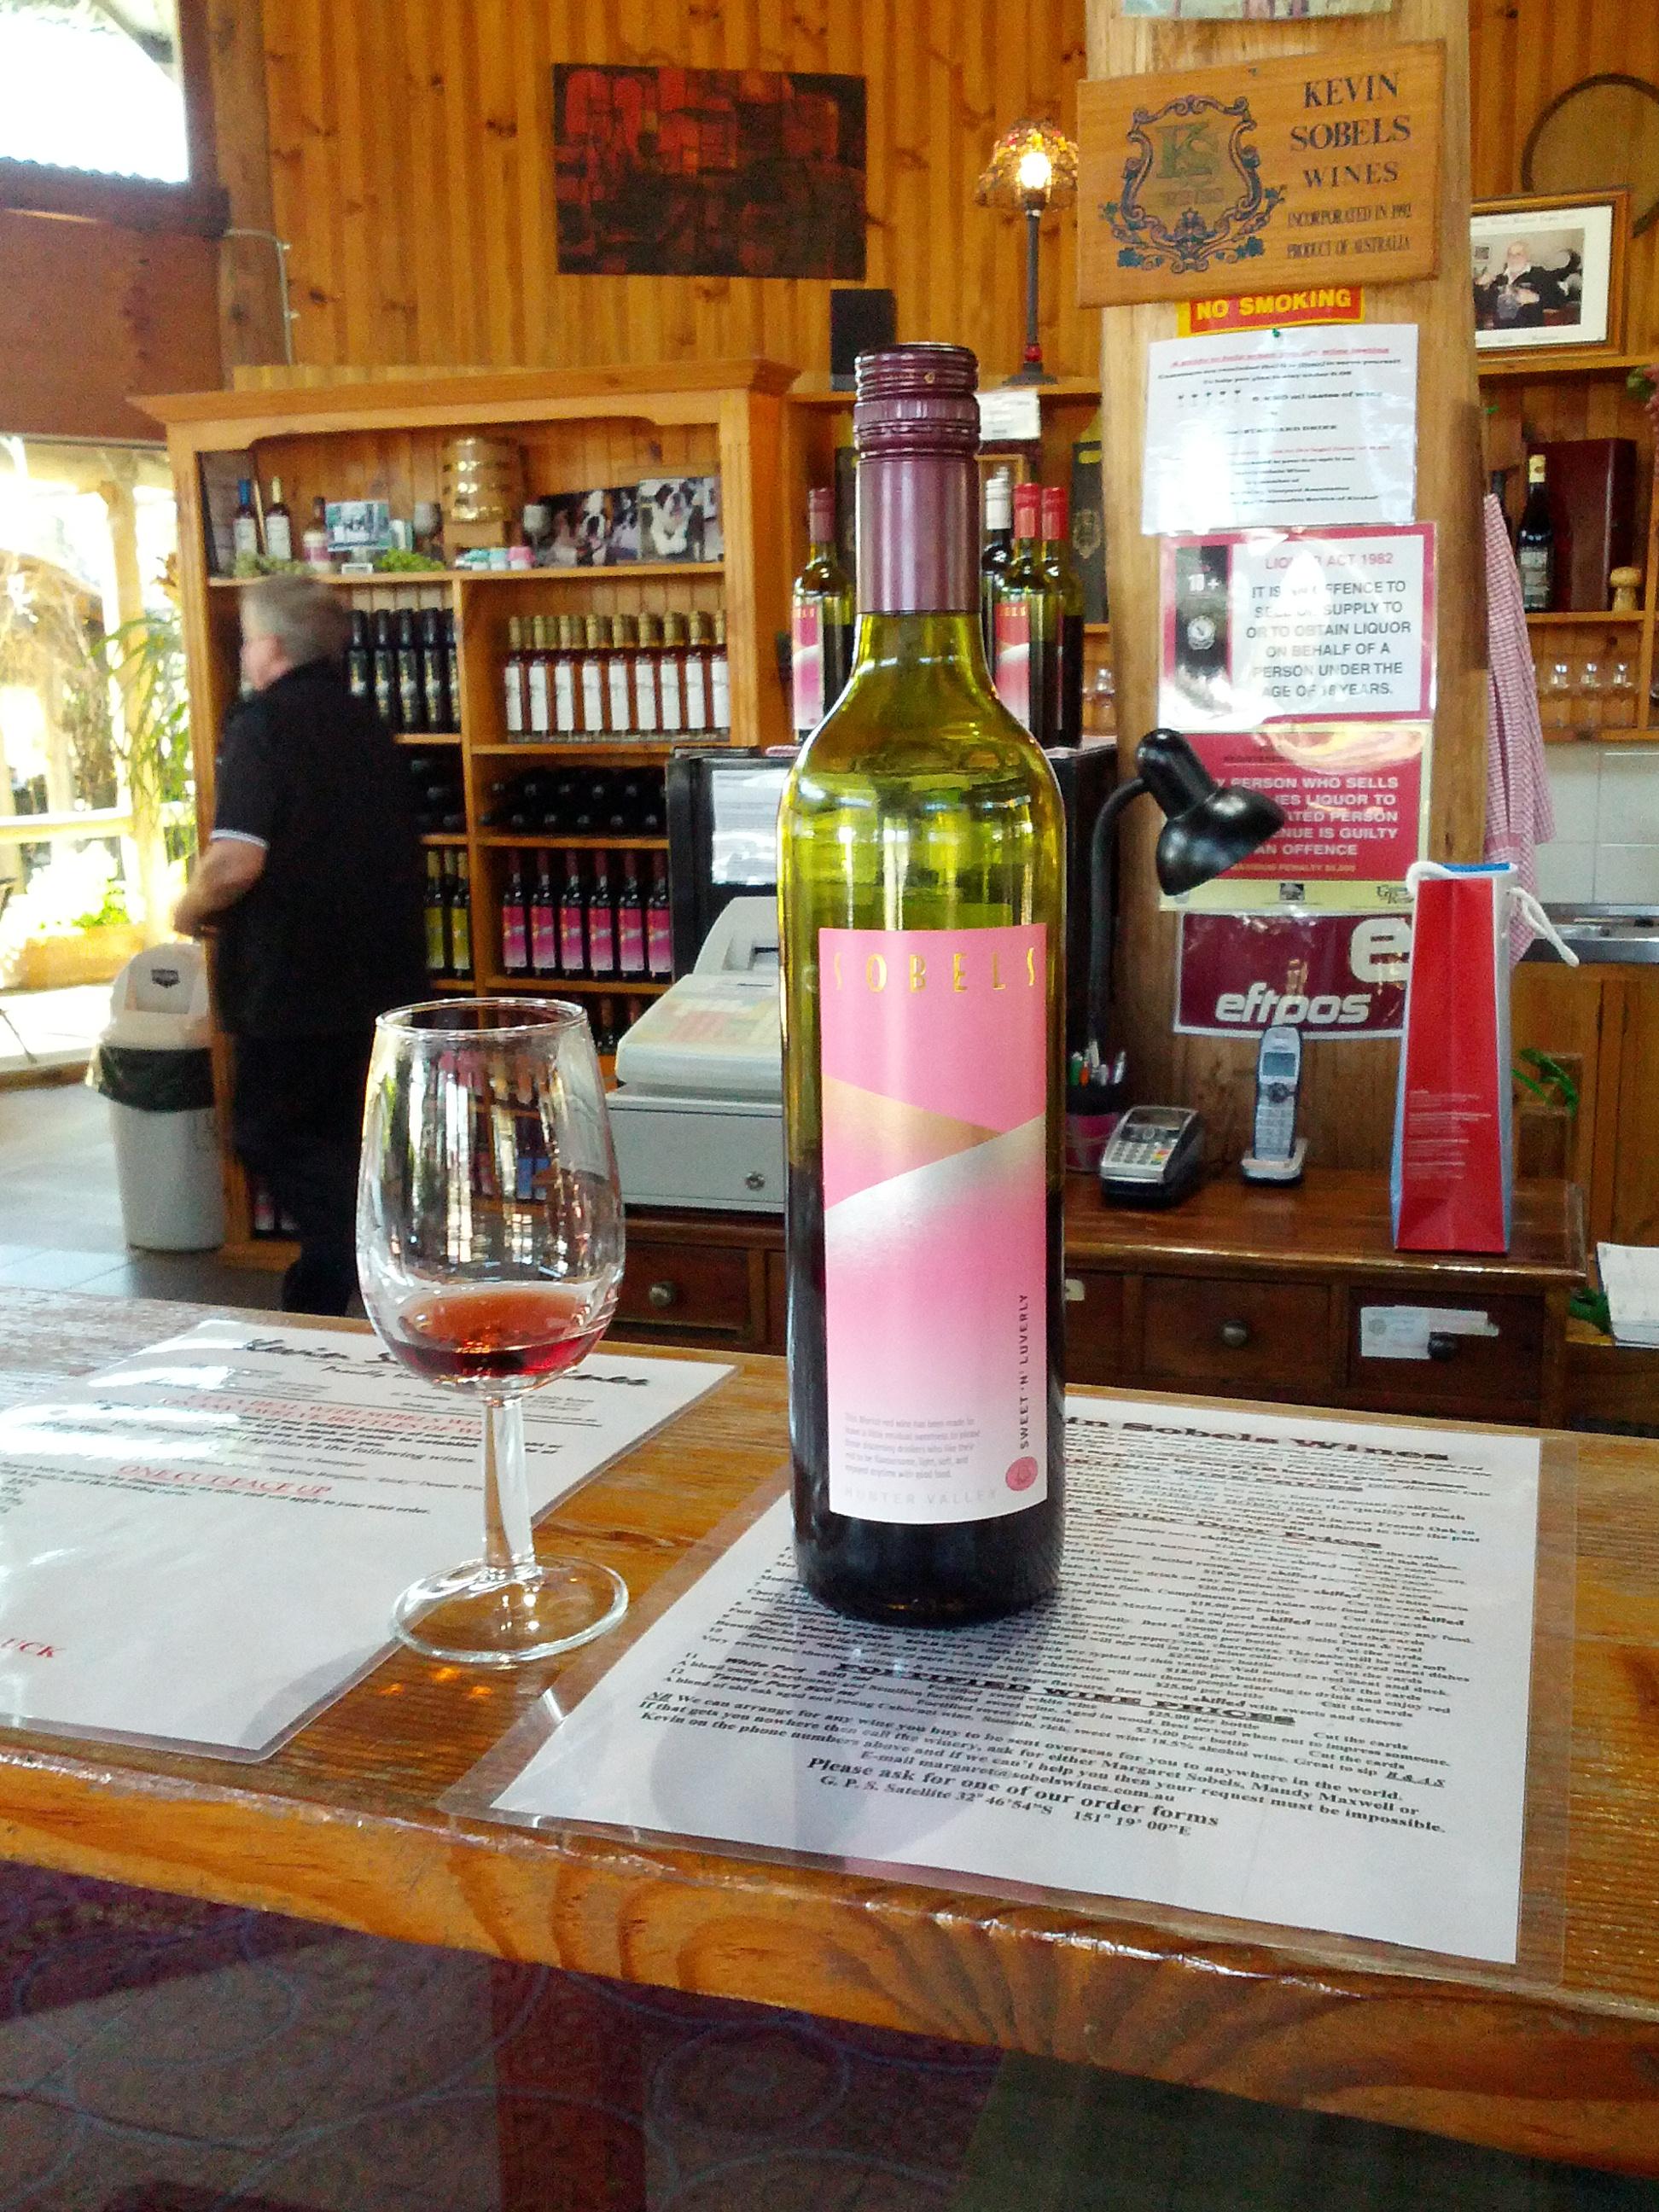 Kevin Sobels - wine tasting